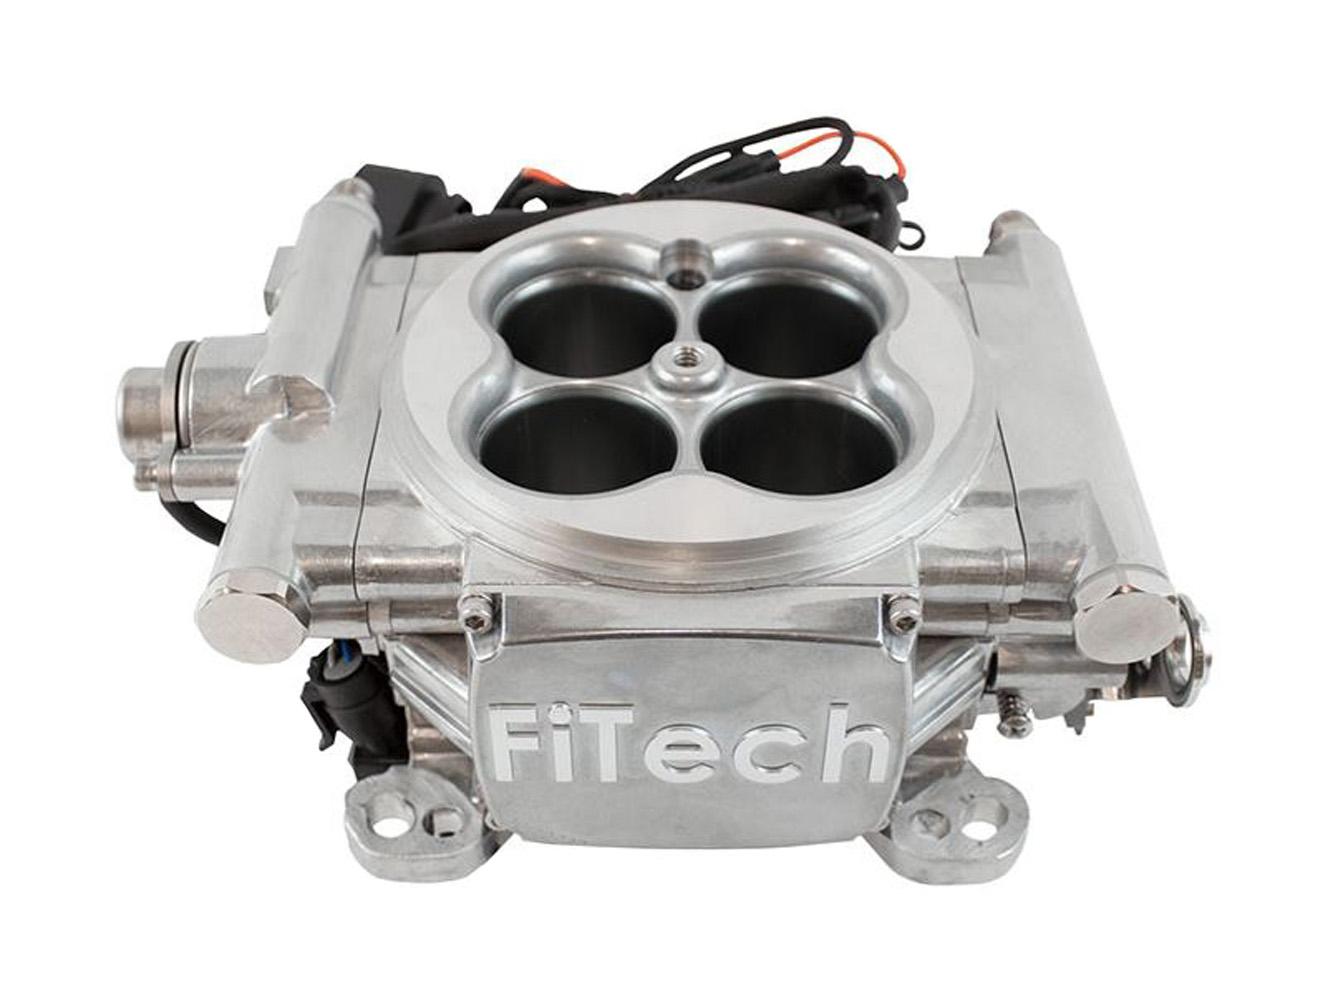 FiTech 30001 Go EFI 4 Series Self-Tuning Throttle-Body EFI System Kit (Aluminum, 600 HP)